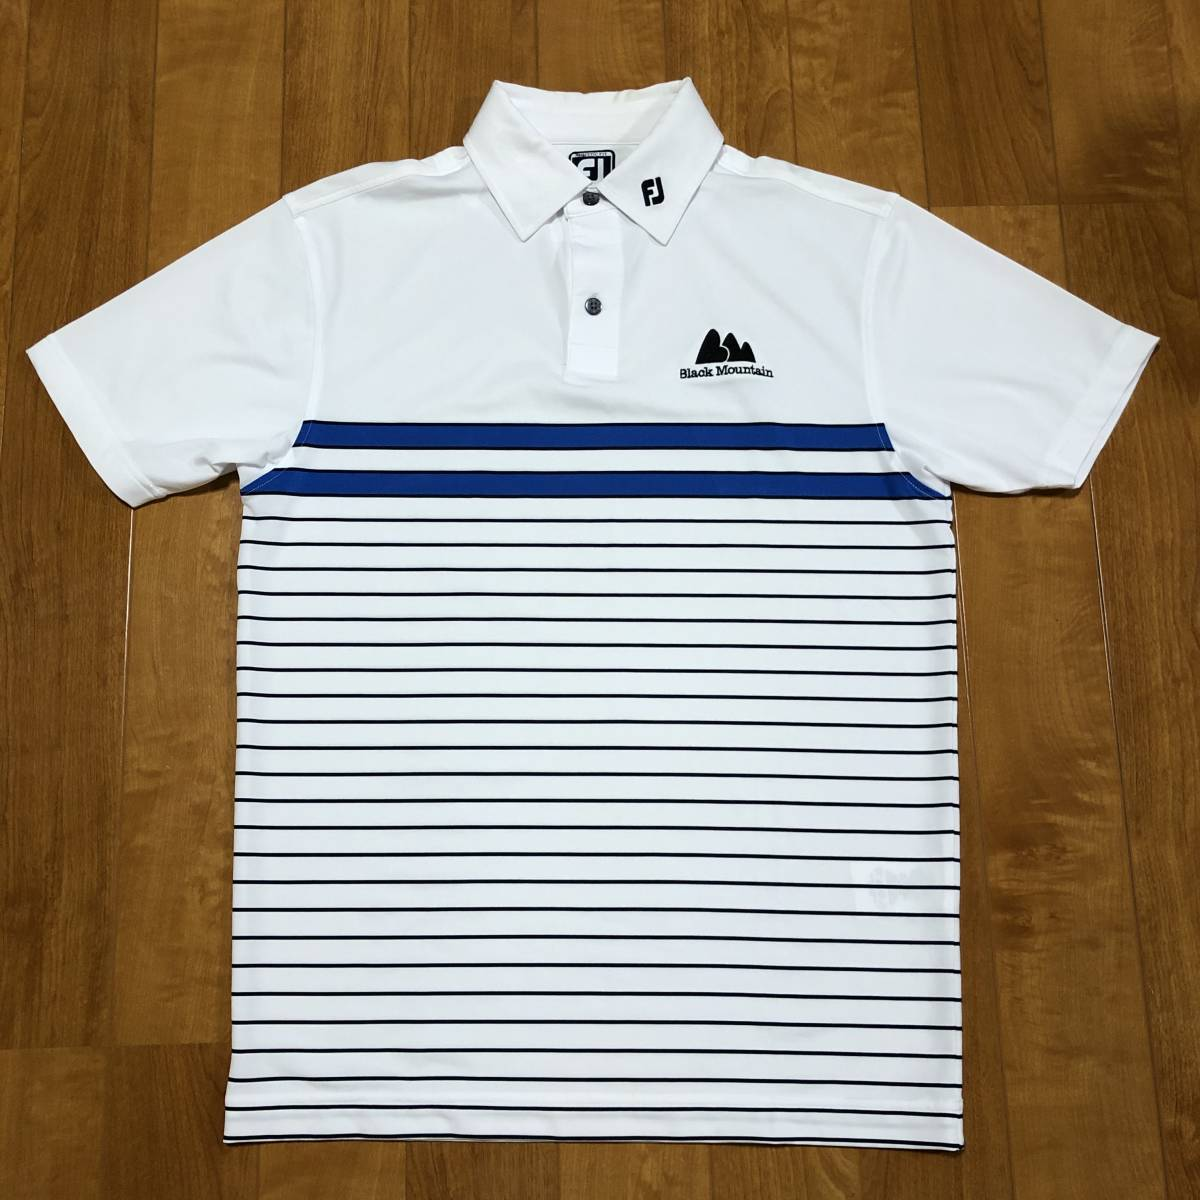 【FOOT JOY】 FJ フットジョイ ゴルフ ウェア 半袖 ポロシャツ メンズ 男性用_画像1